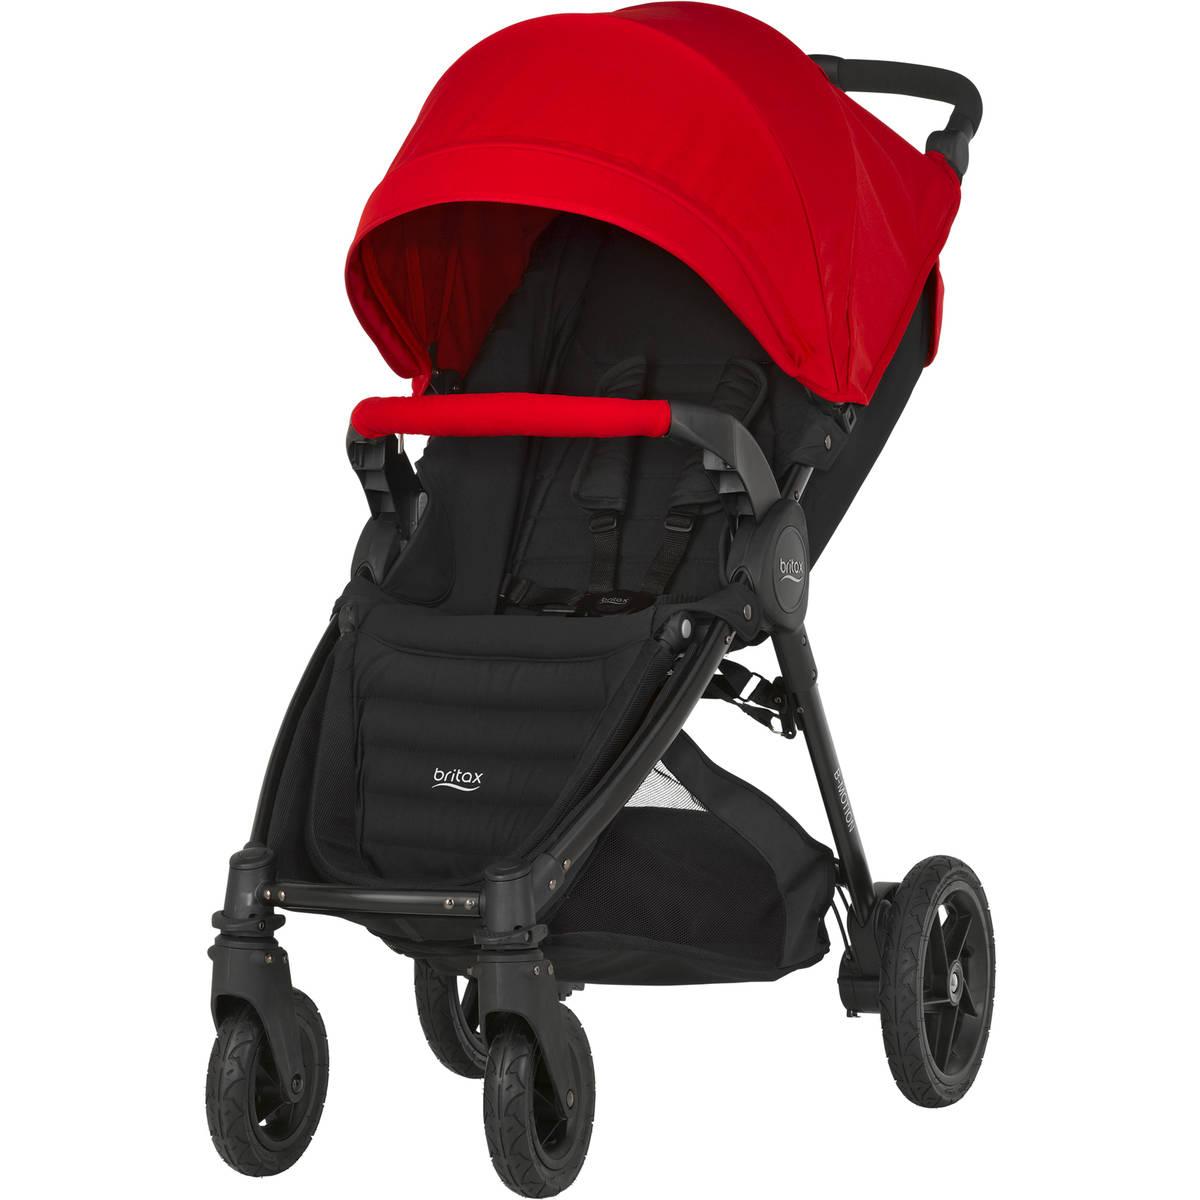 Flame Red - Matkarattaat - 3633320012 - 12